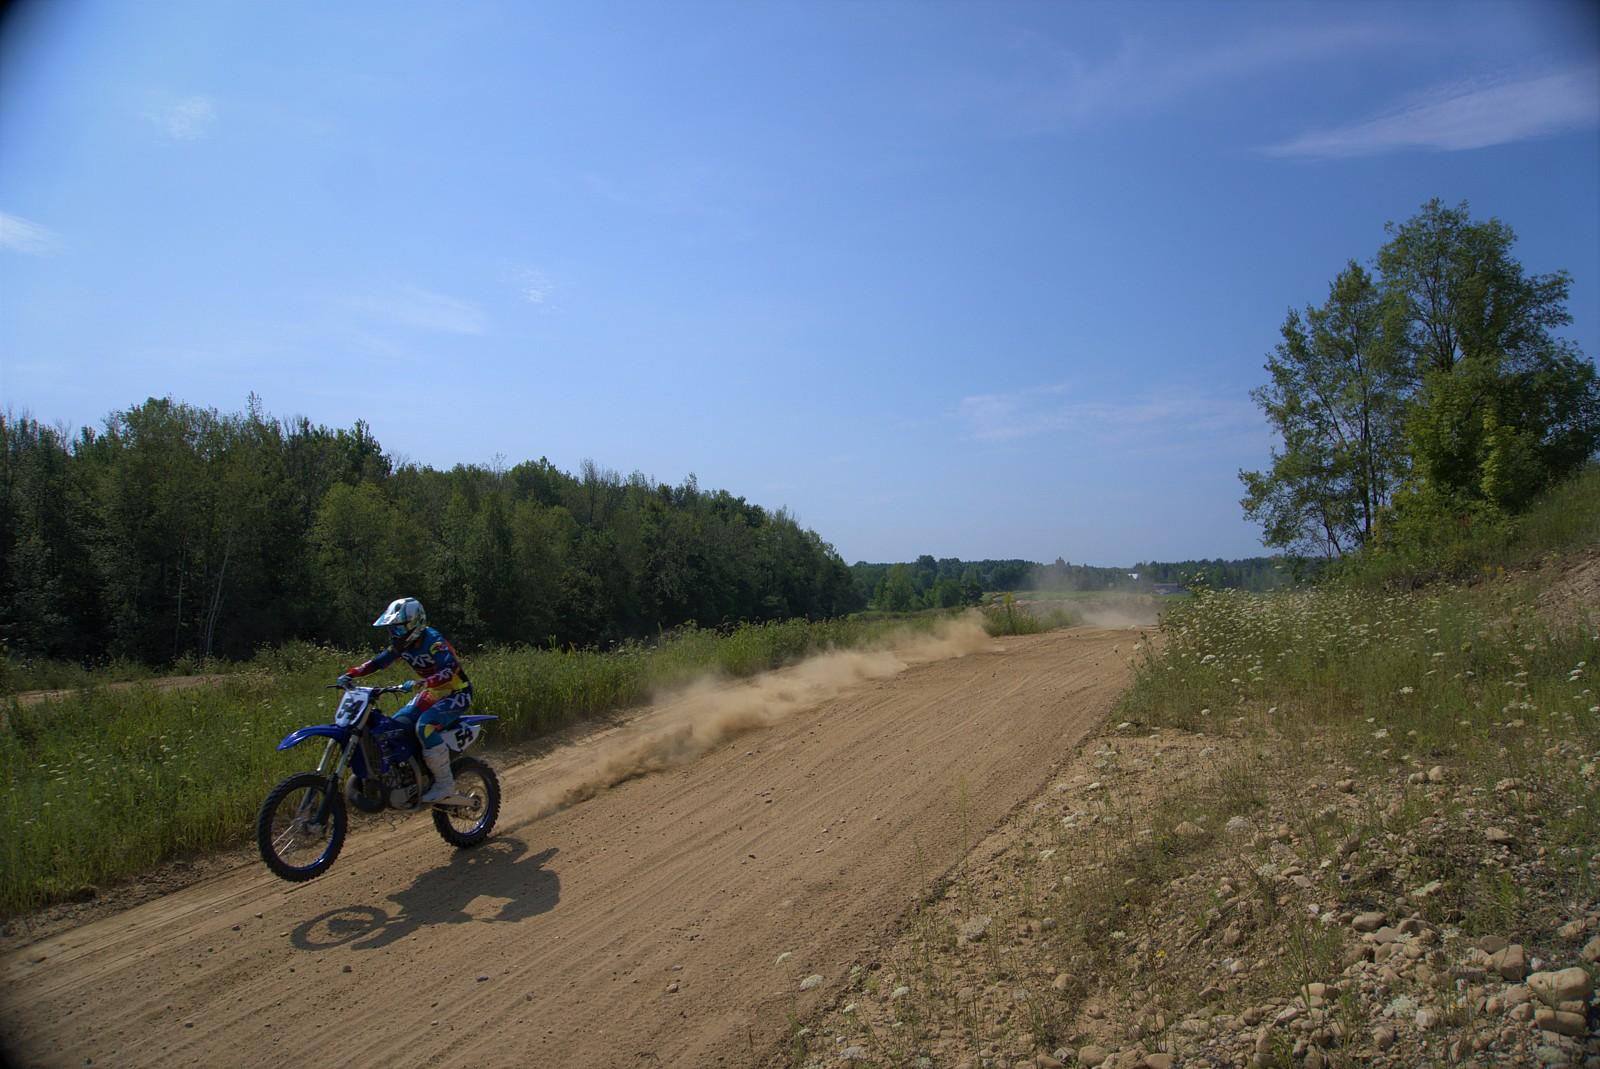 Photo 9 - DawsonBMX54 - Motocross Pictures - Vital MX